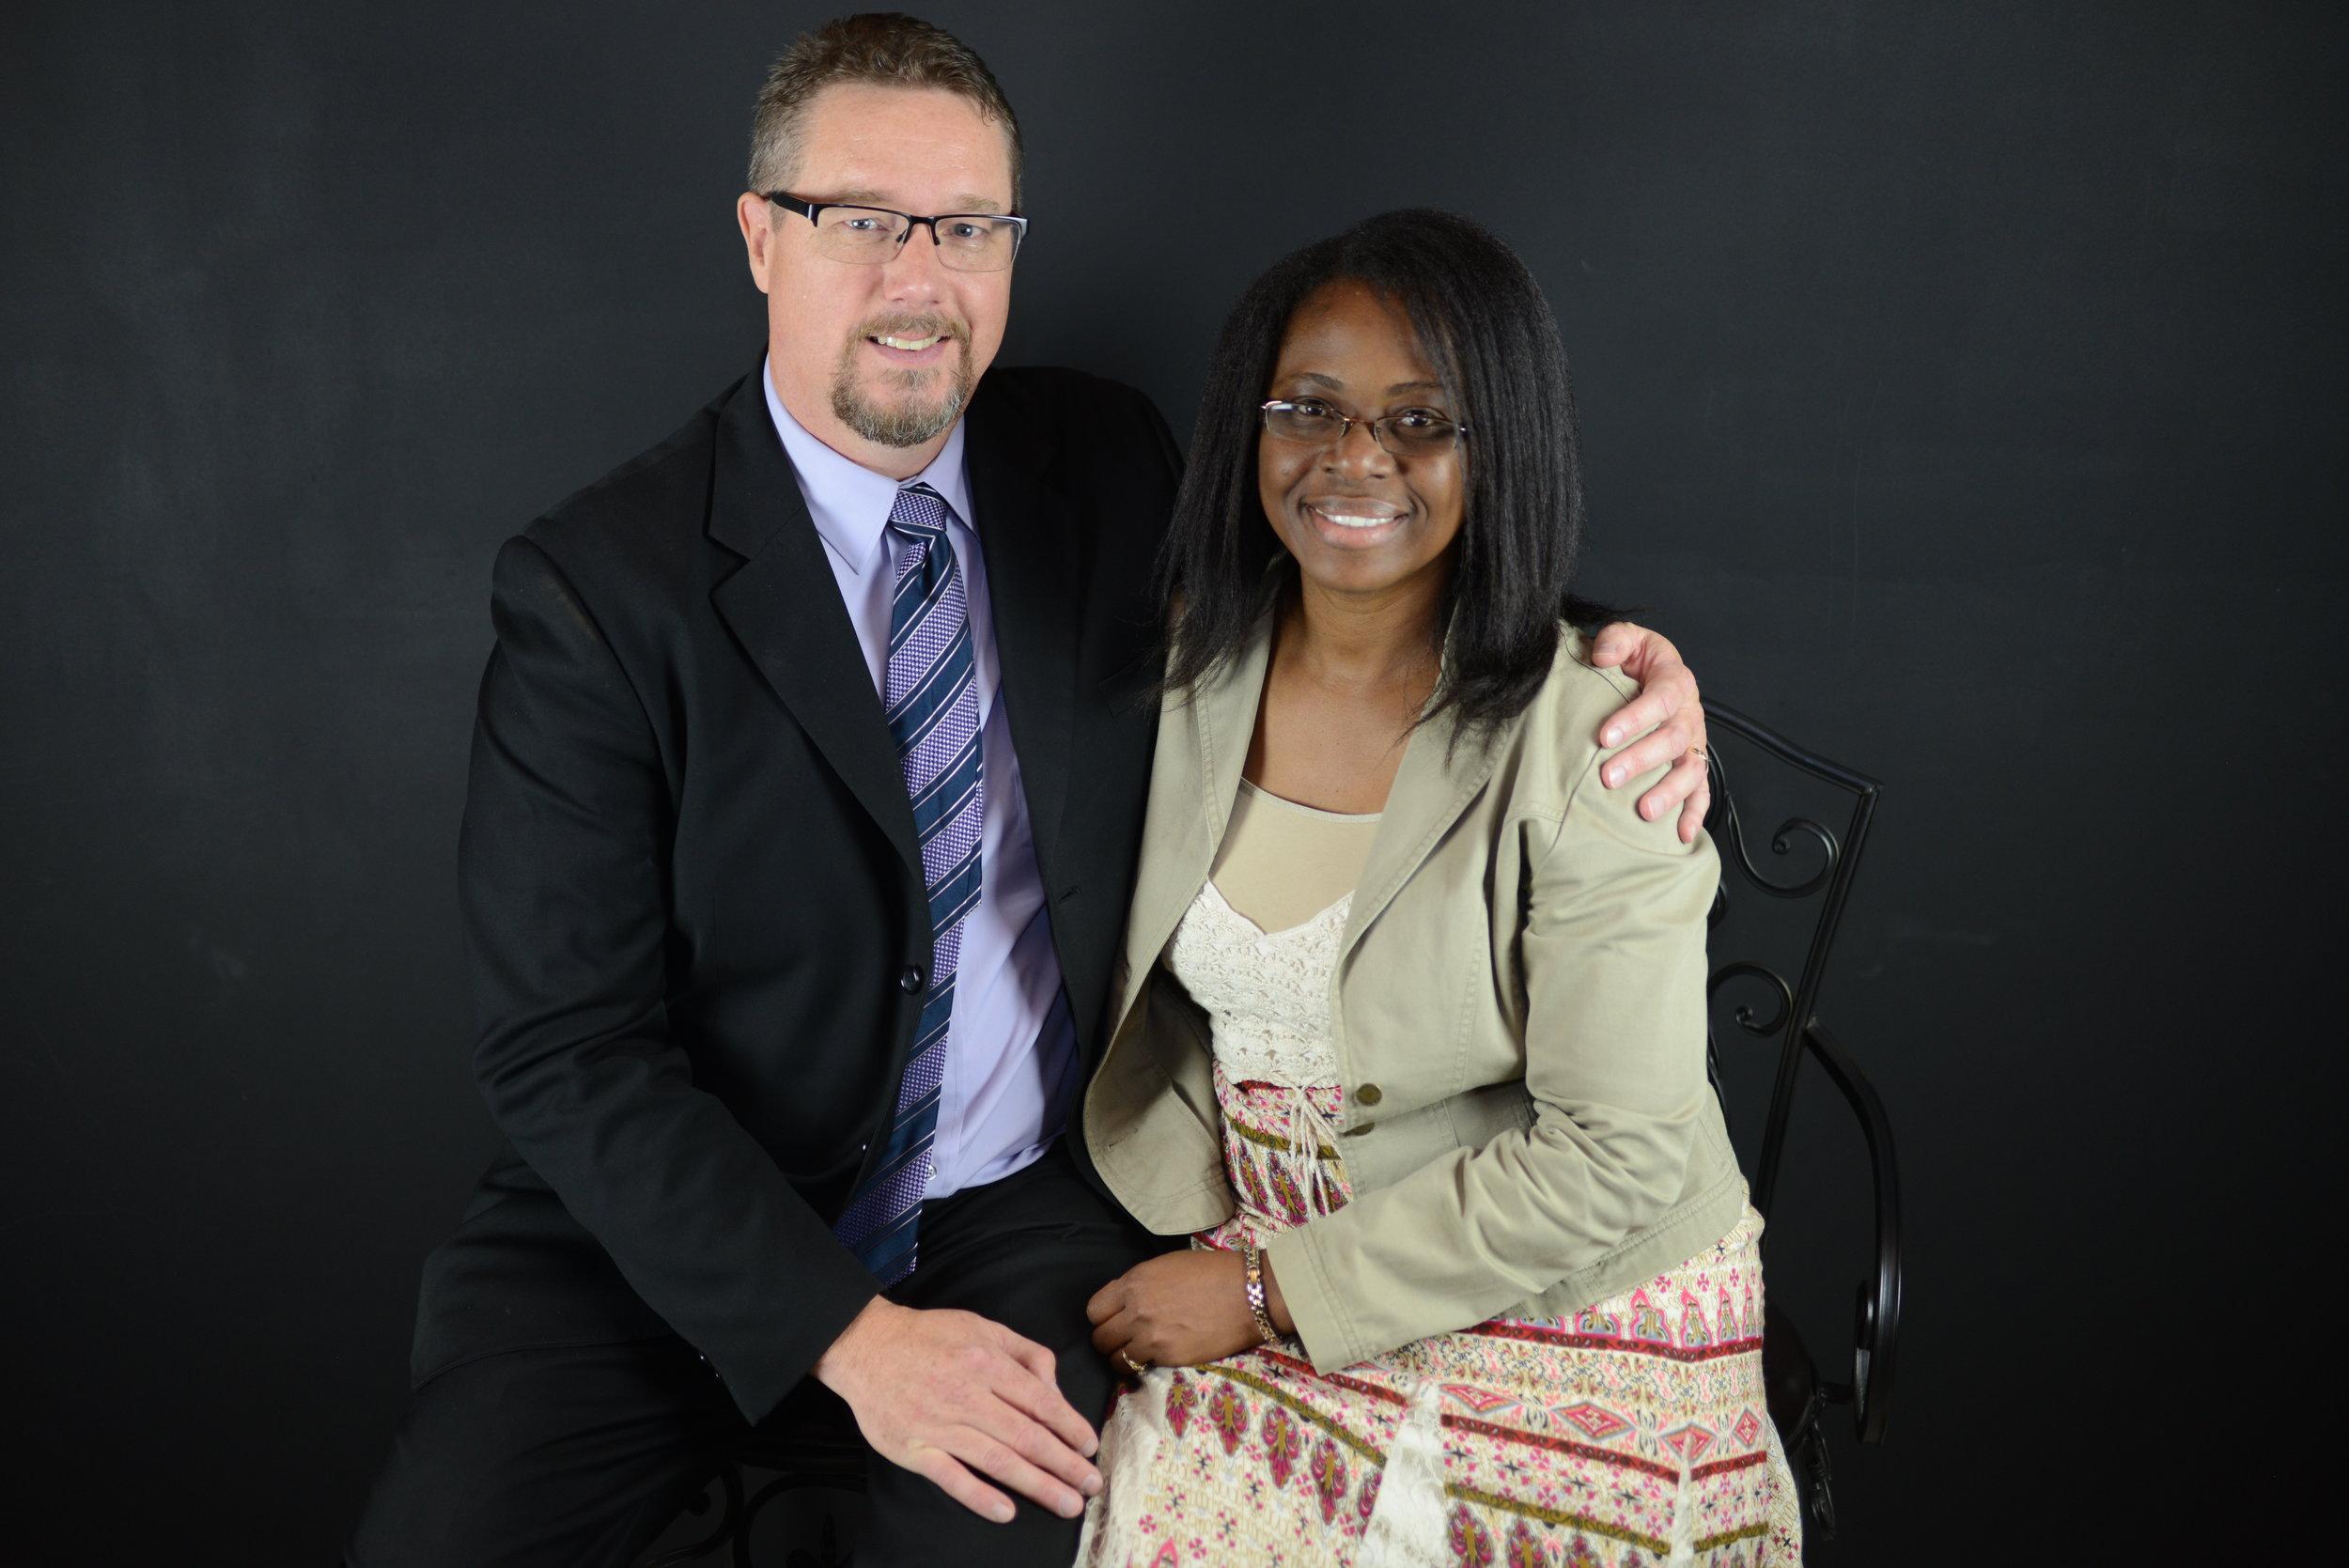 Paul & Veronica Crabtree - Trustee Board